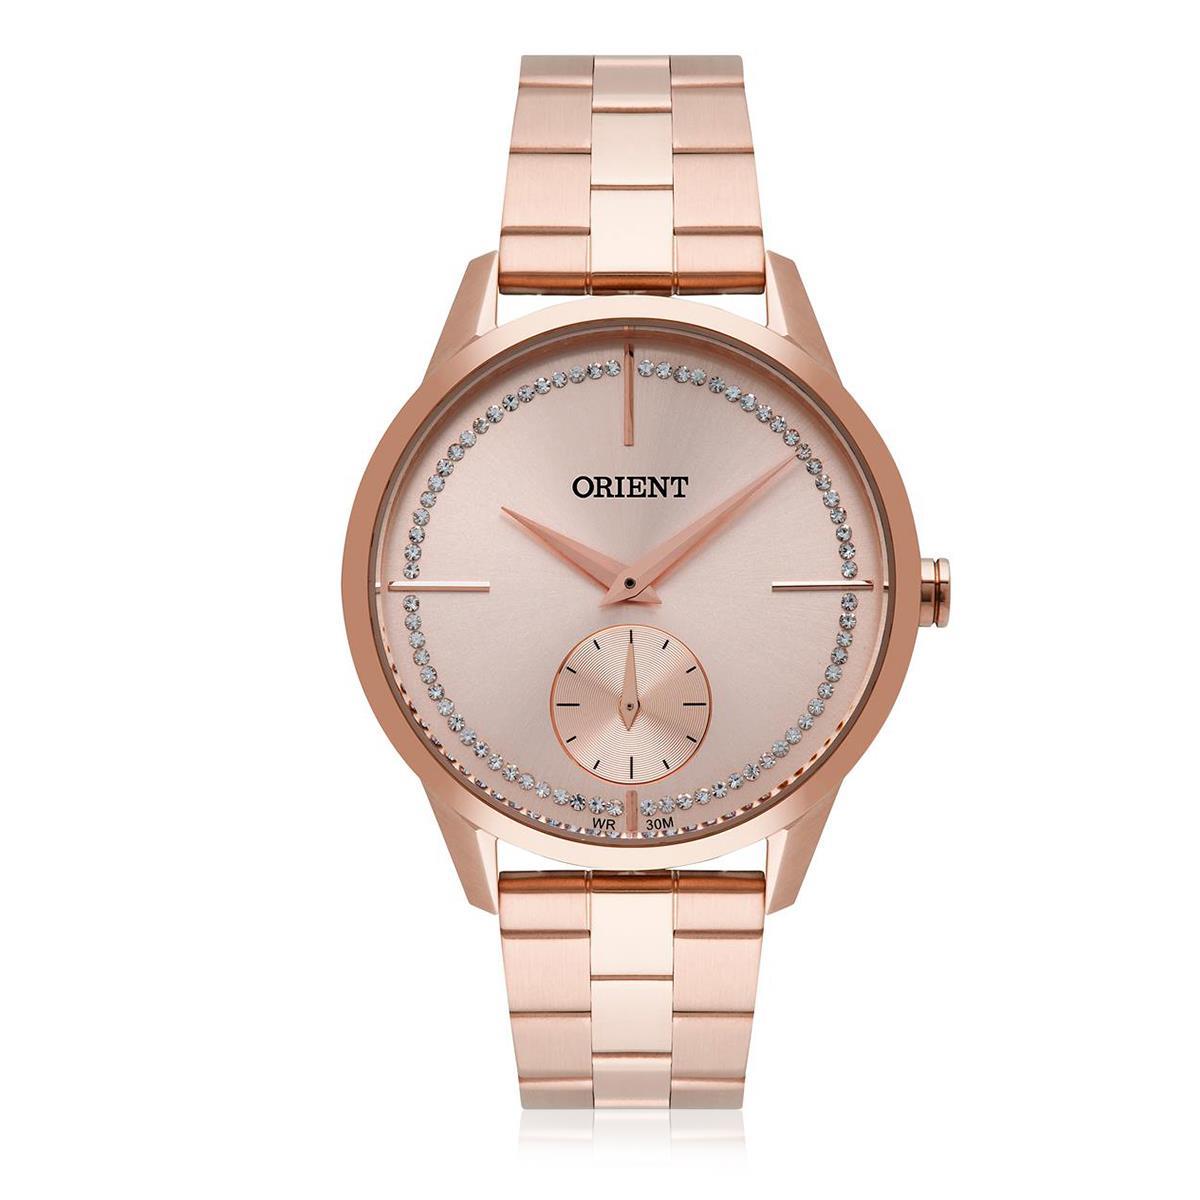 d020e2ebcdd Relógio Feminino Orient Analógico FRSS0030 R1RX Rose